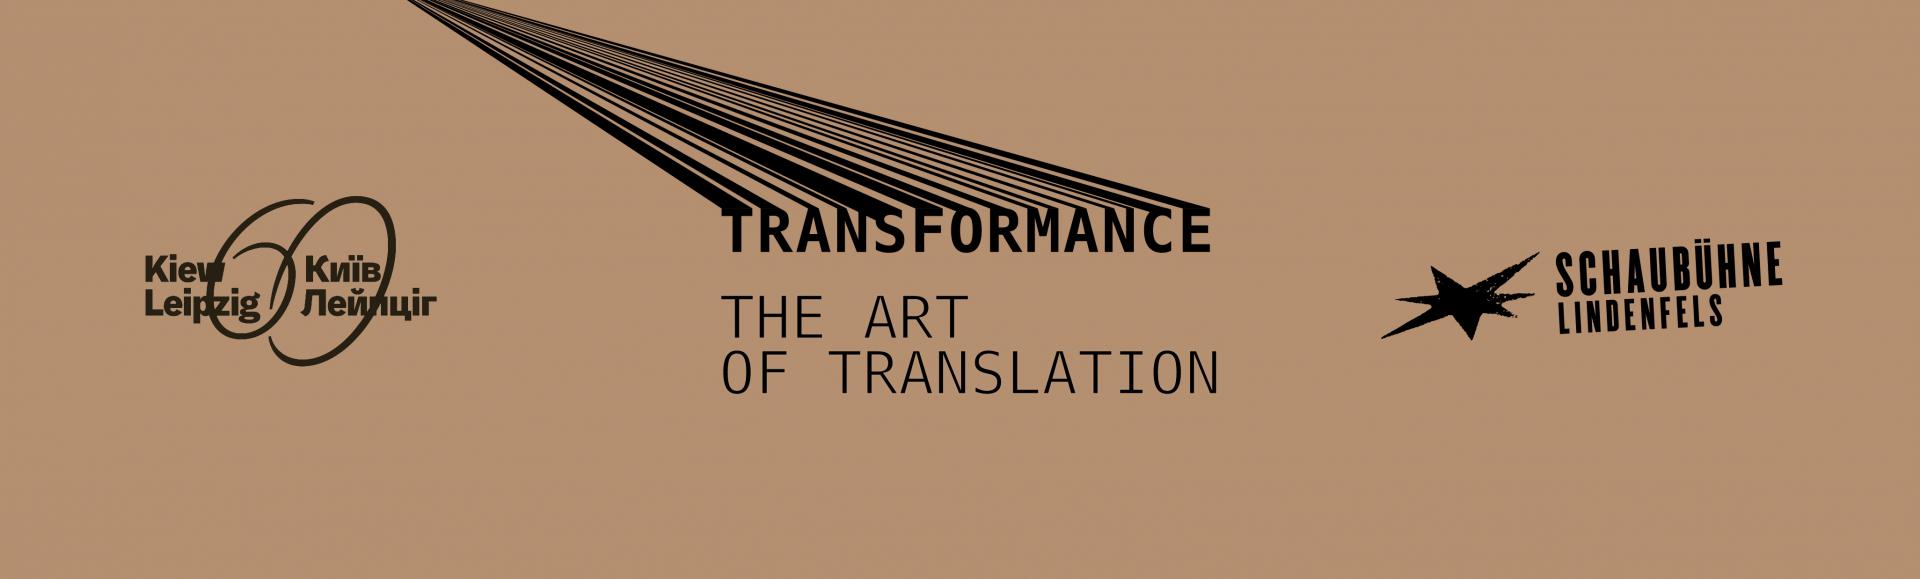 TRANSFORMANCE – THE ART OF TRANSLATION